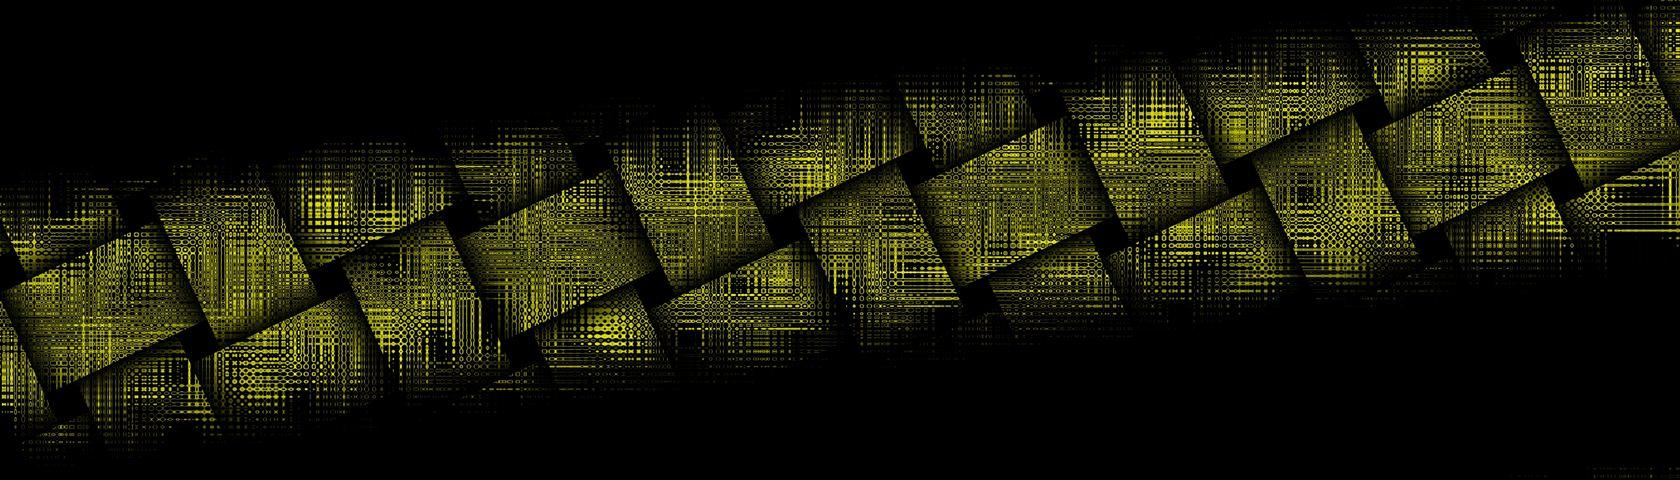 Weaving the Matrix Yellow